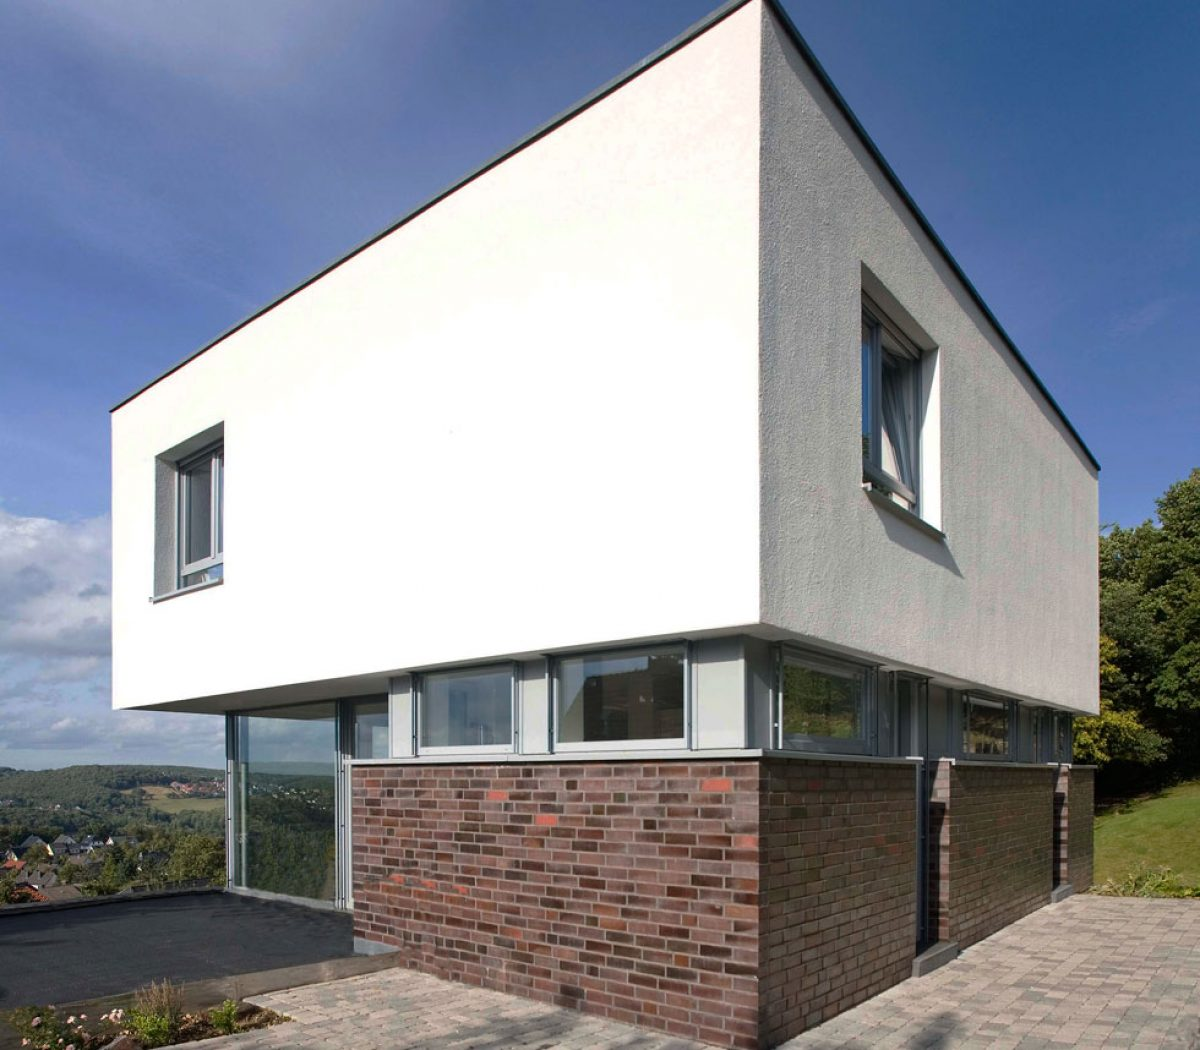 Bauwerk Architekten Dortmund Ri2